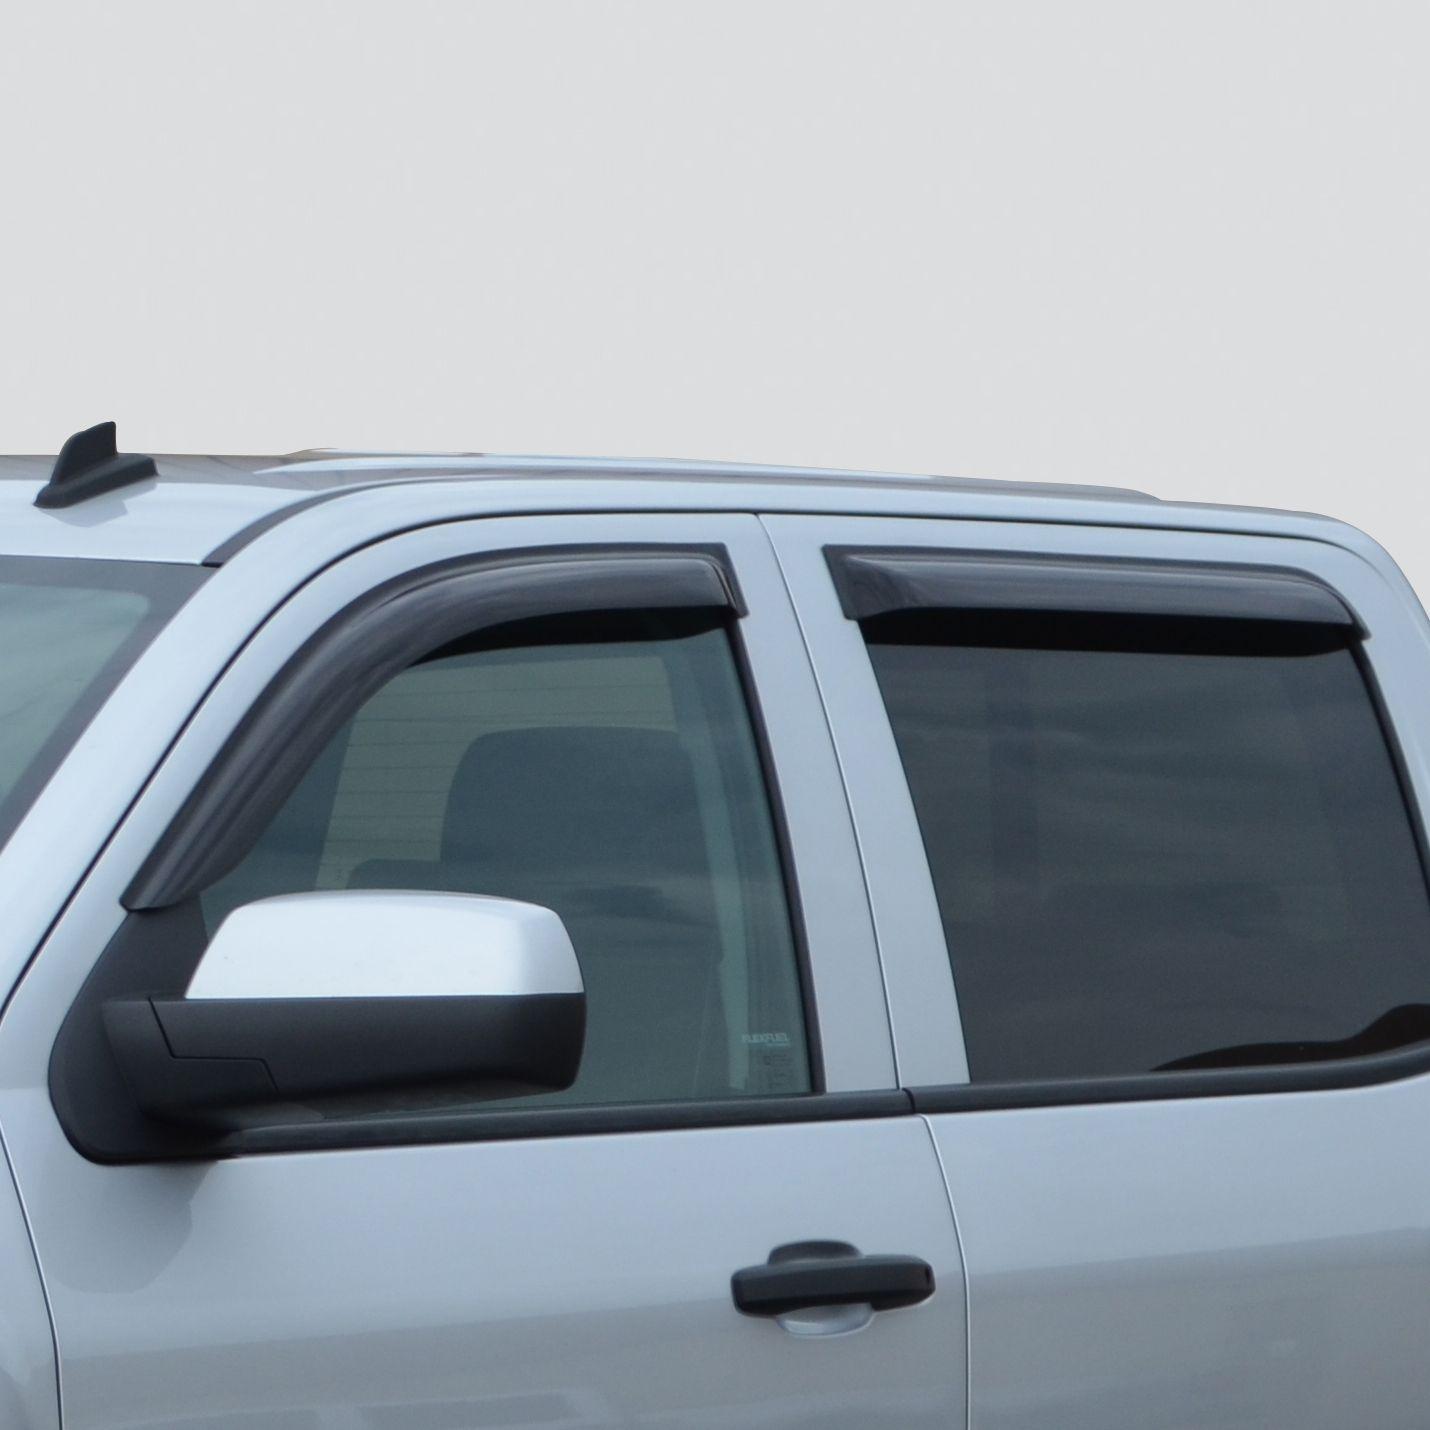 2016 Silverado 2500 Crew Cab Side Window, Weather